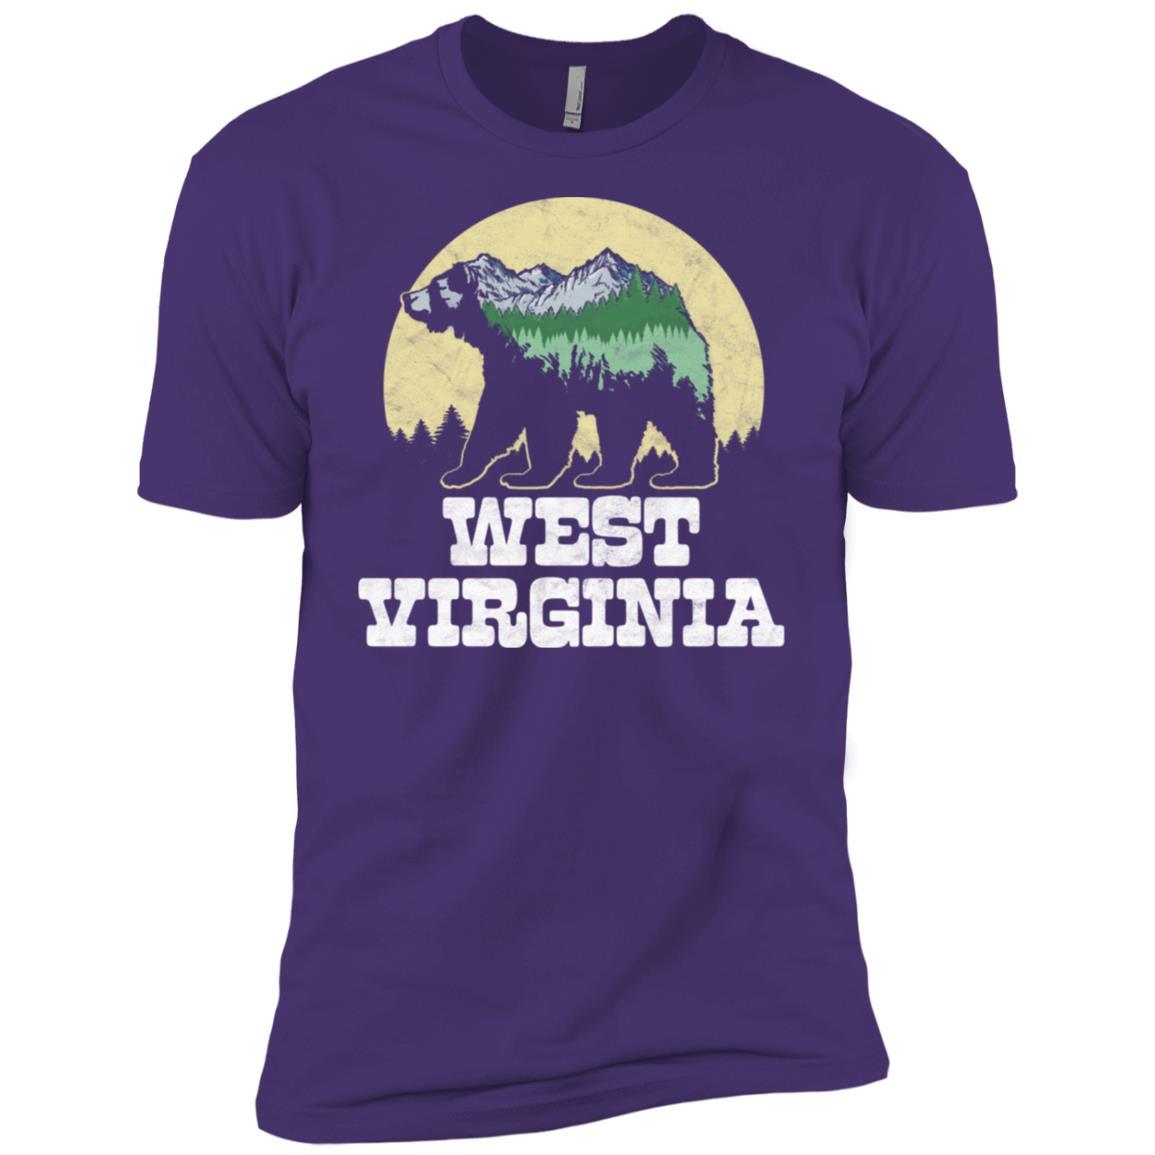 West Virginia Bear Sketch Mountains & Trees Tee Men Short Sleeve T-Shirt